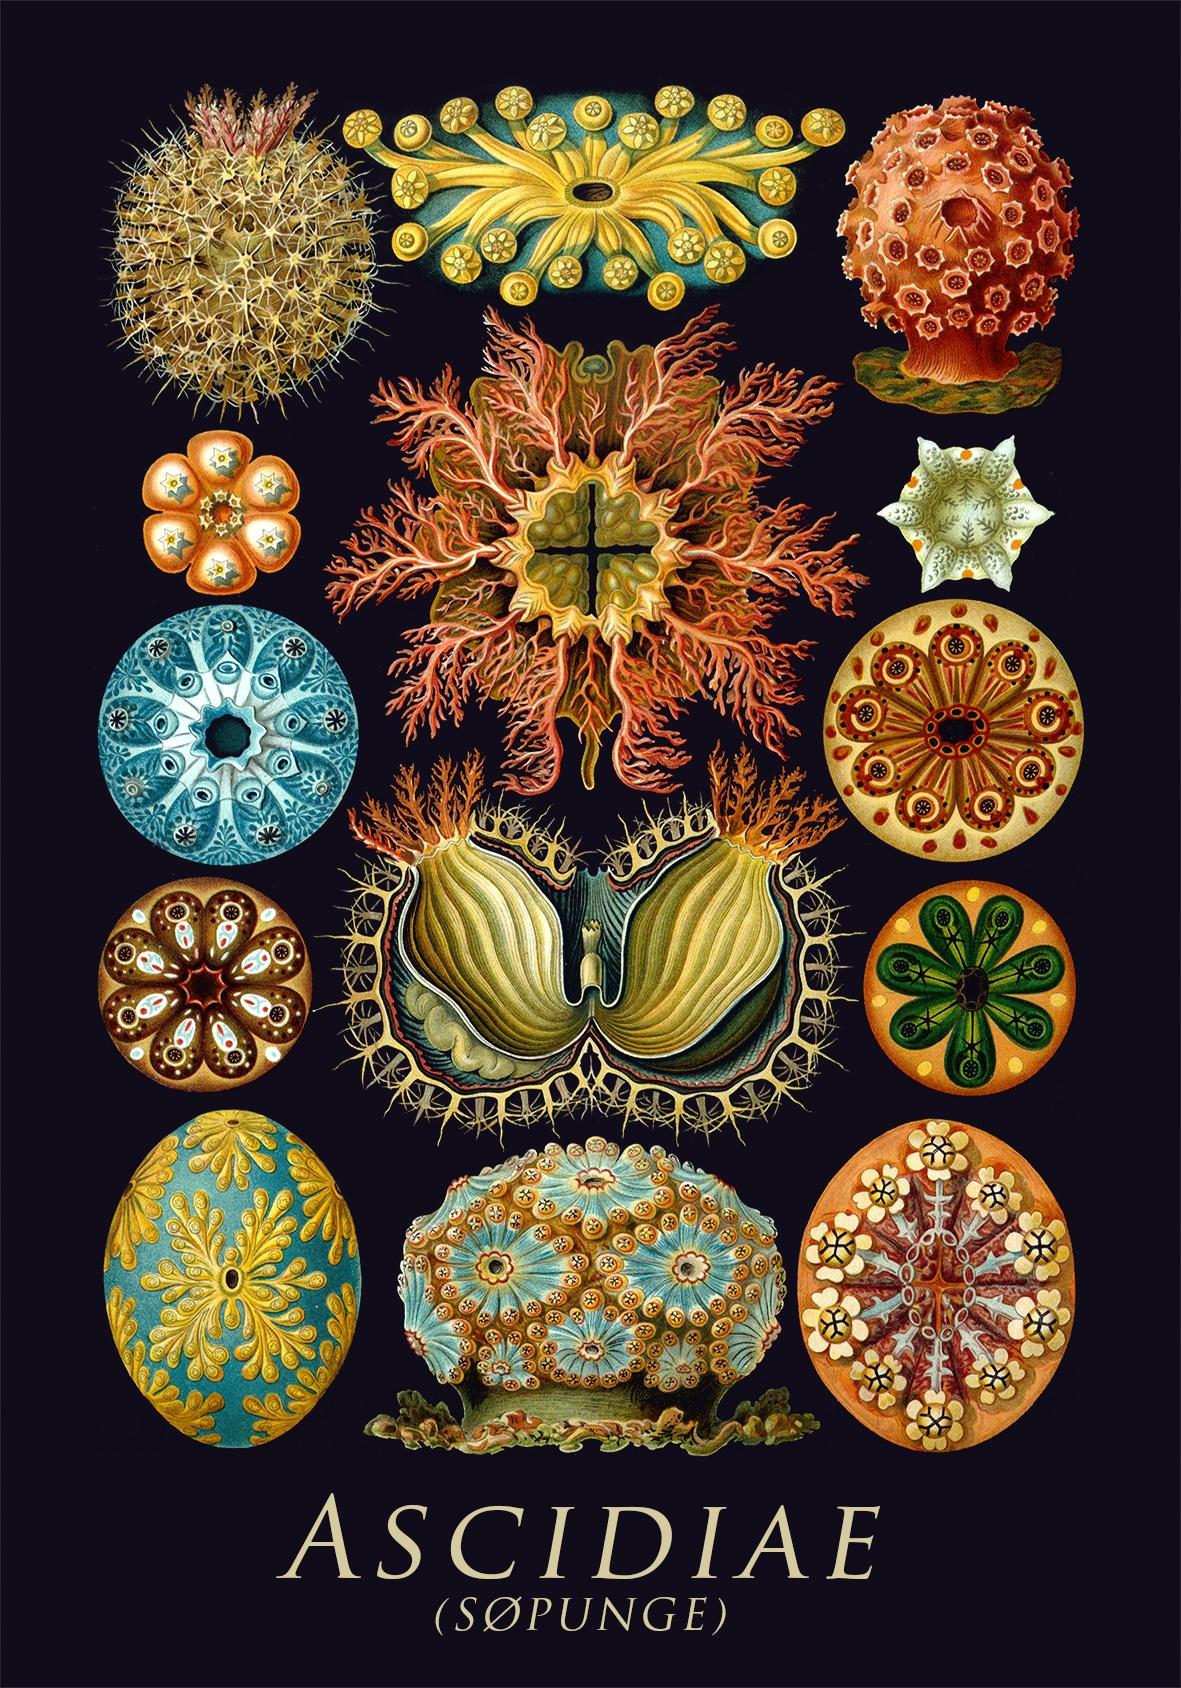 Ascidiae - Søpunge Plakat